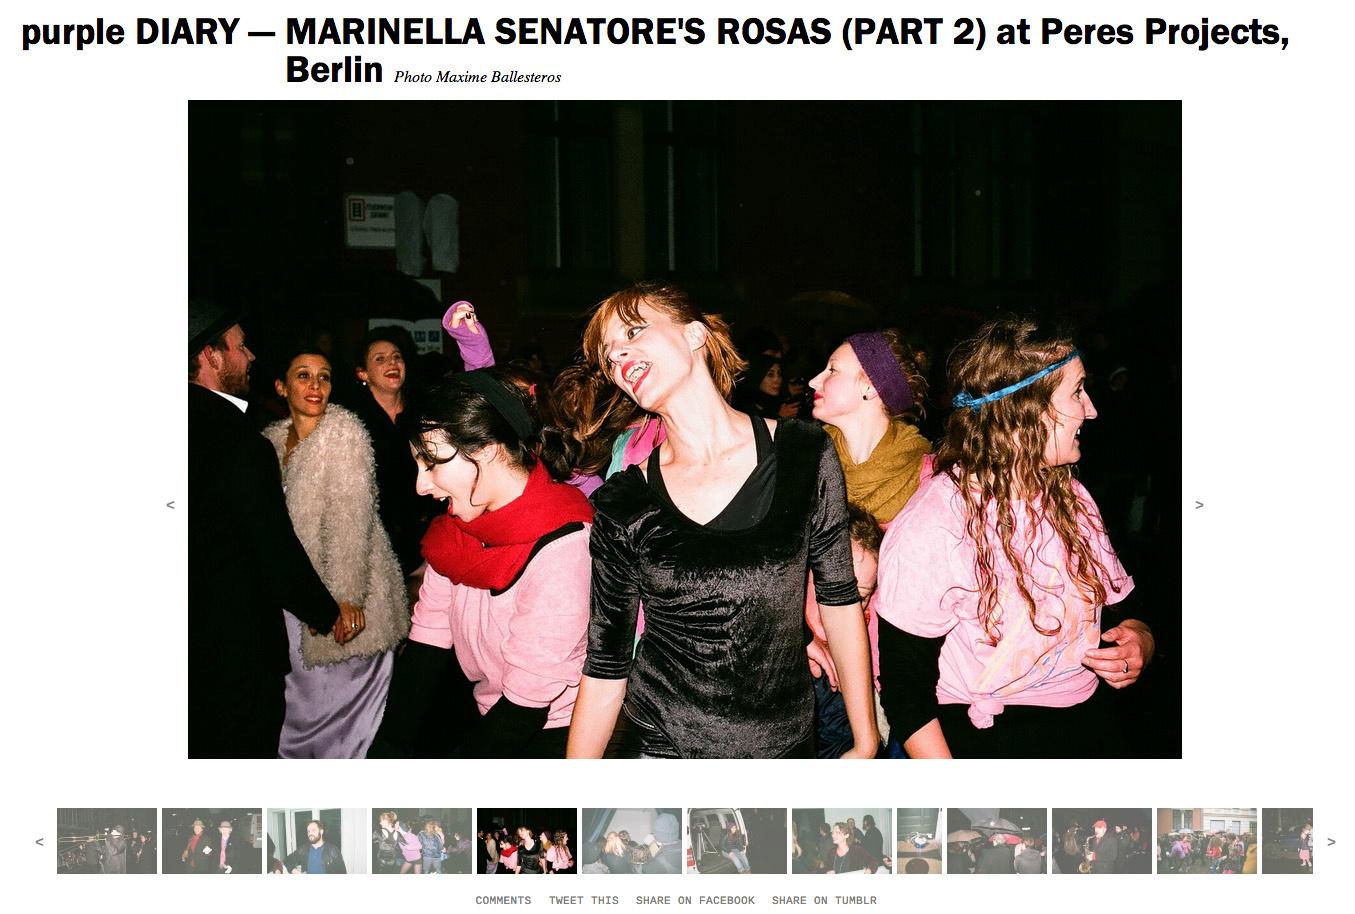 purple DIARY   MARINELLA SENATORE S ROSAS  PART 2  at Peres Projects  Berlin.jpg